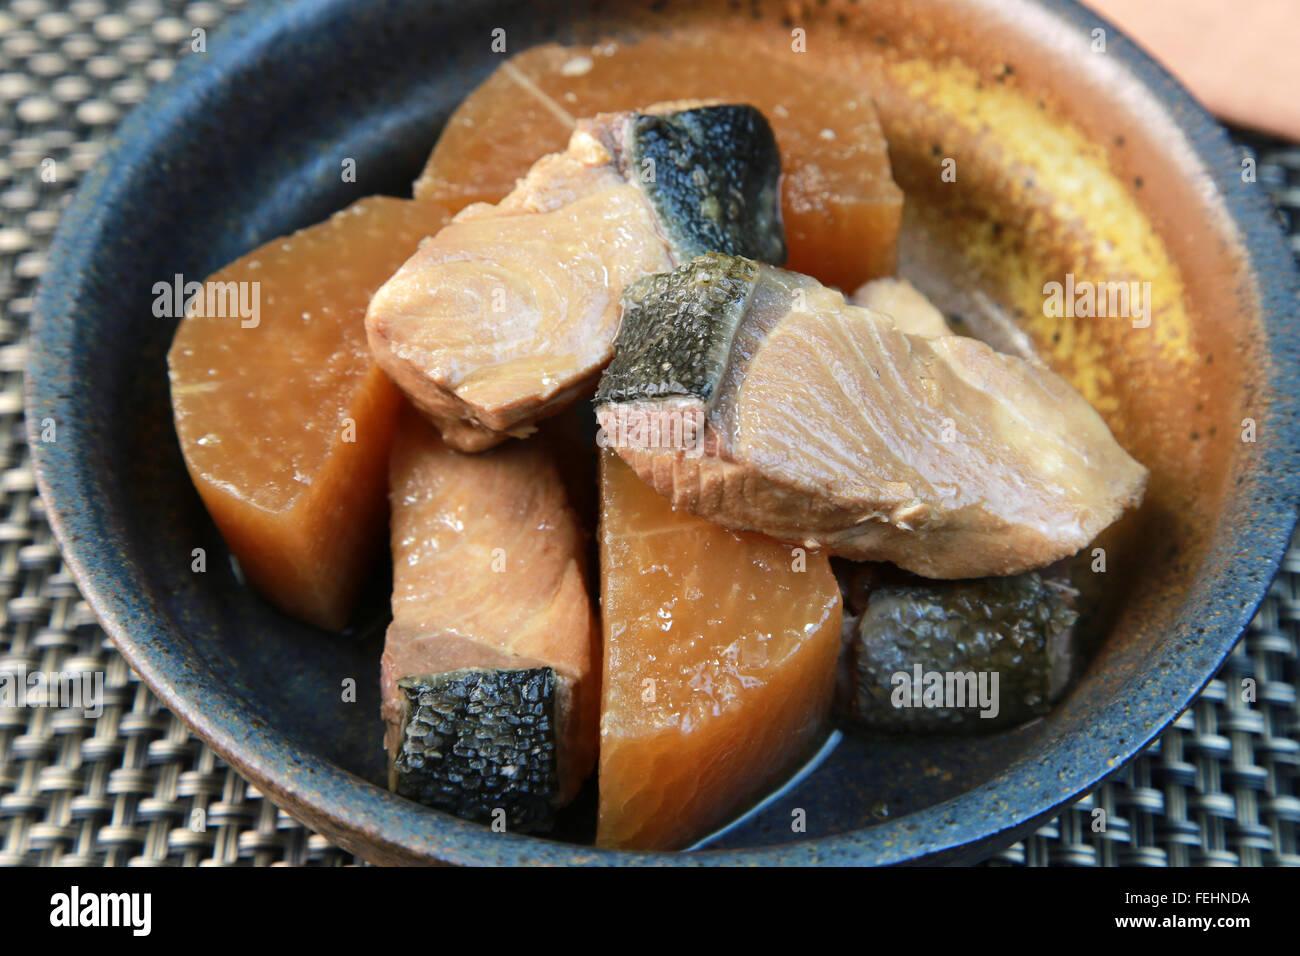 Yellowtail and Japanese radish - Stock Image